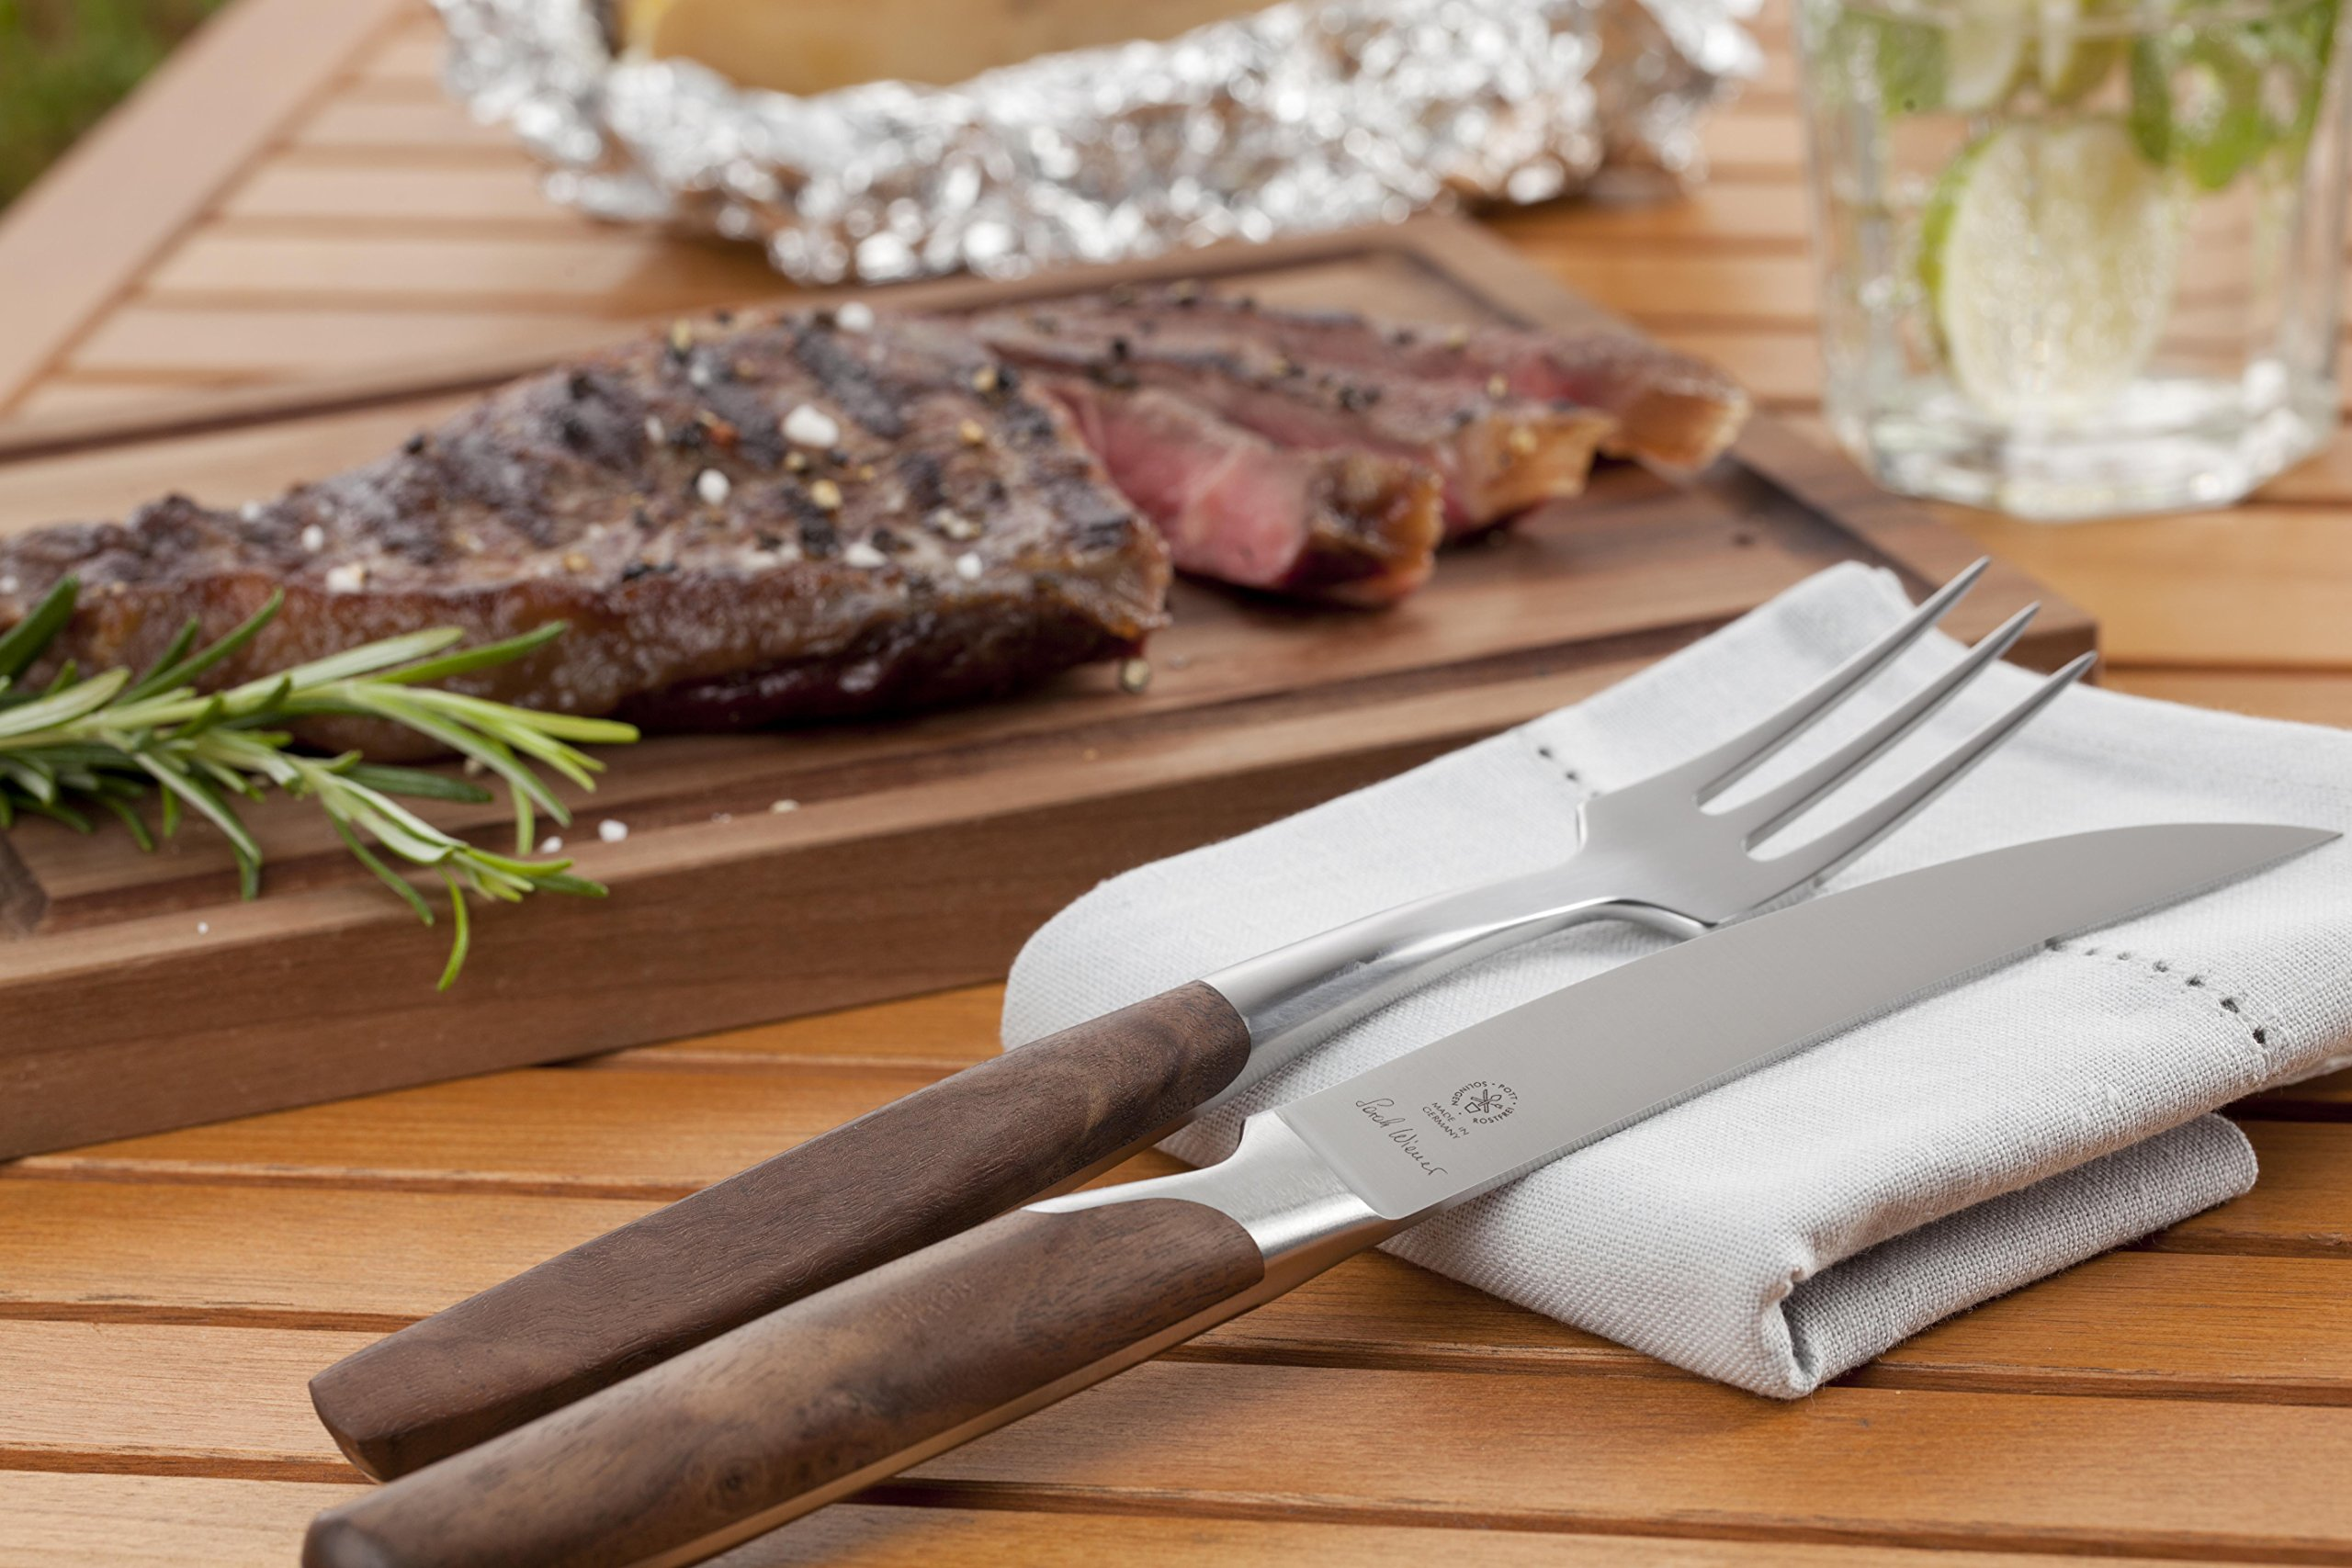 Mono Pott By Sarah Weiner Steak Cutlery Set, Fork + Knife W Micro Serration, Plum Wood